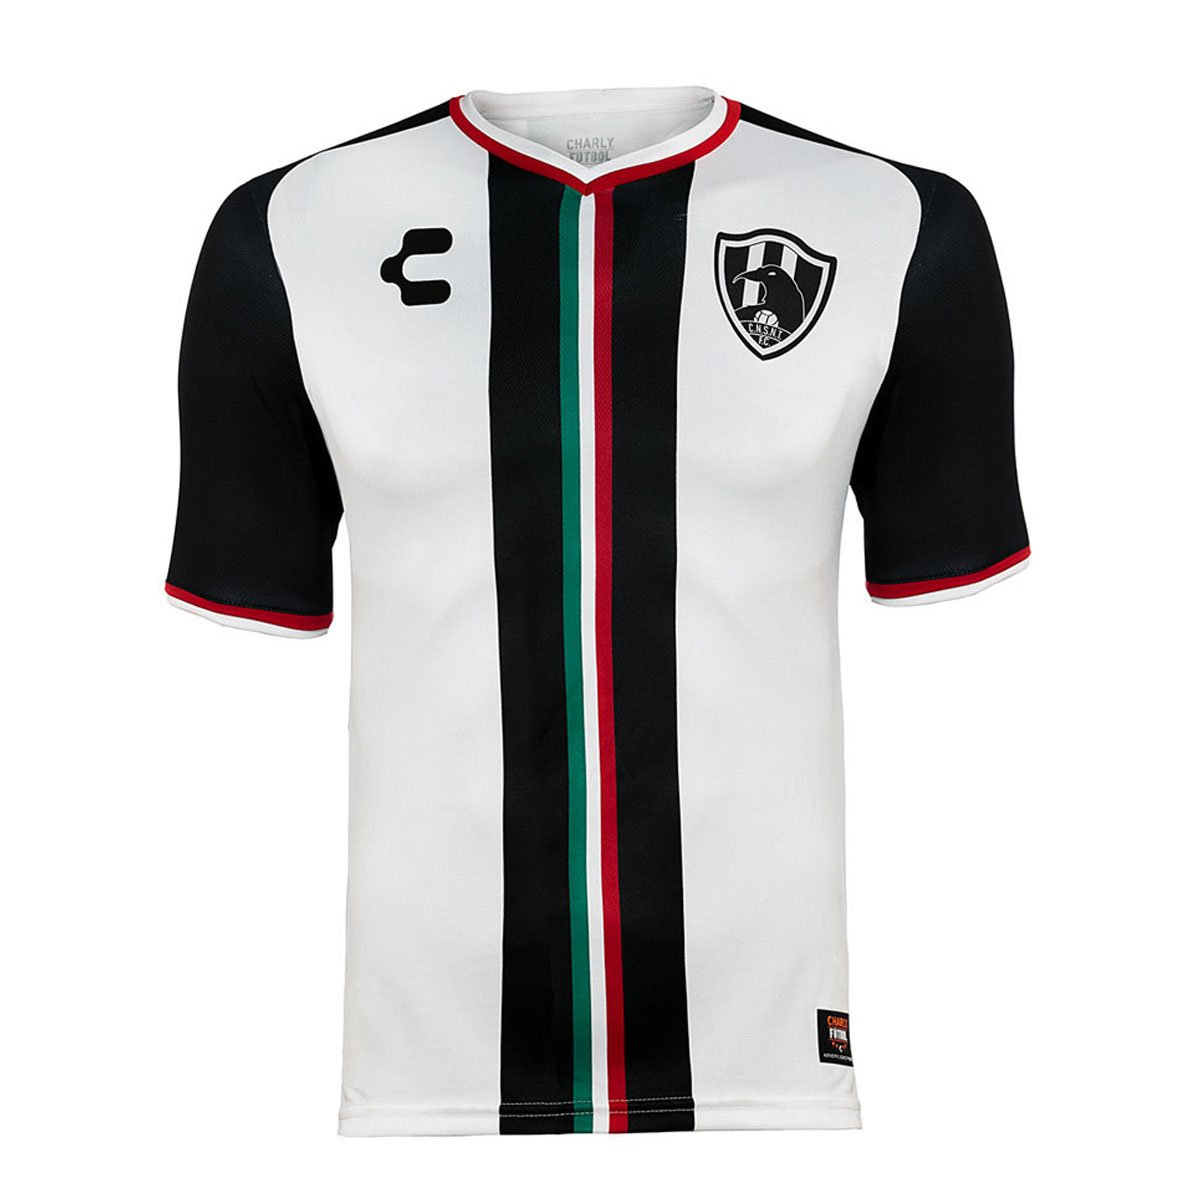 Jersey Club De Cuervos 2018 Local Charly - Caballero  a7a0a892898f3